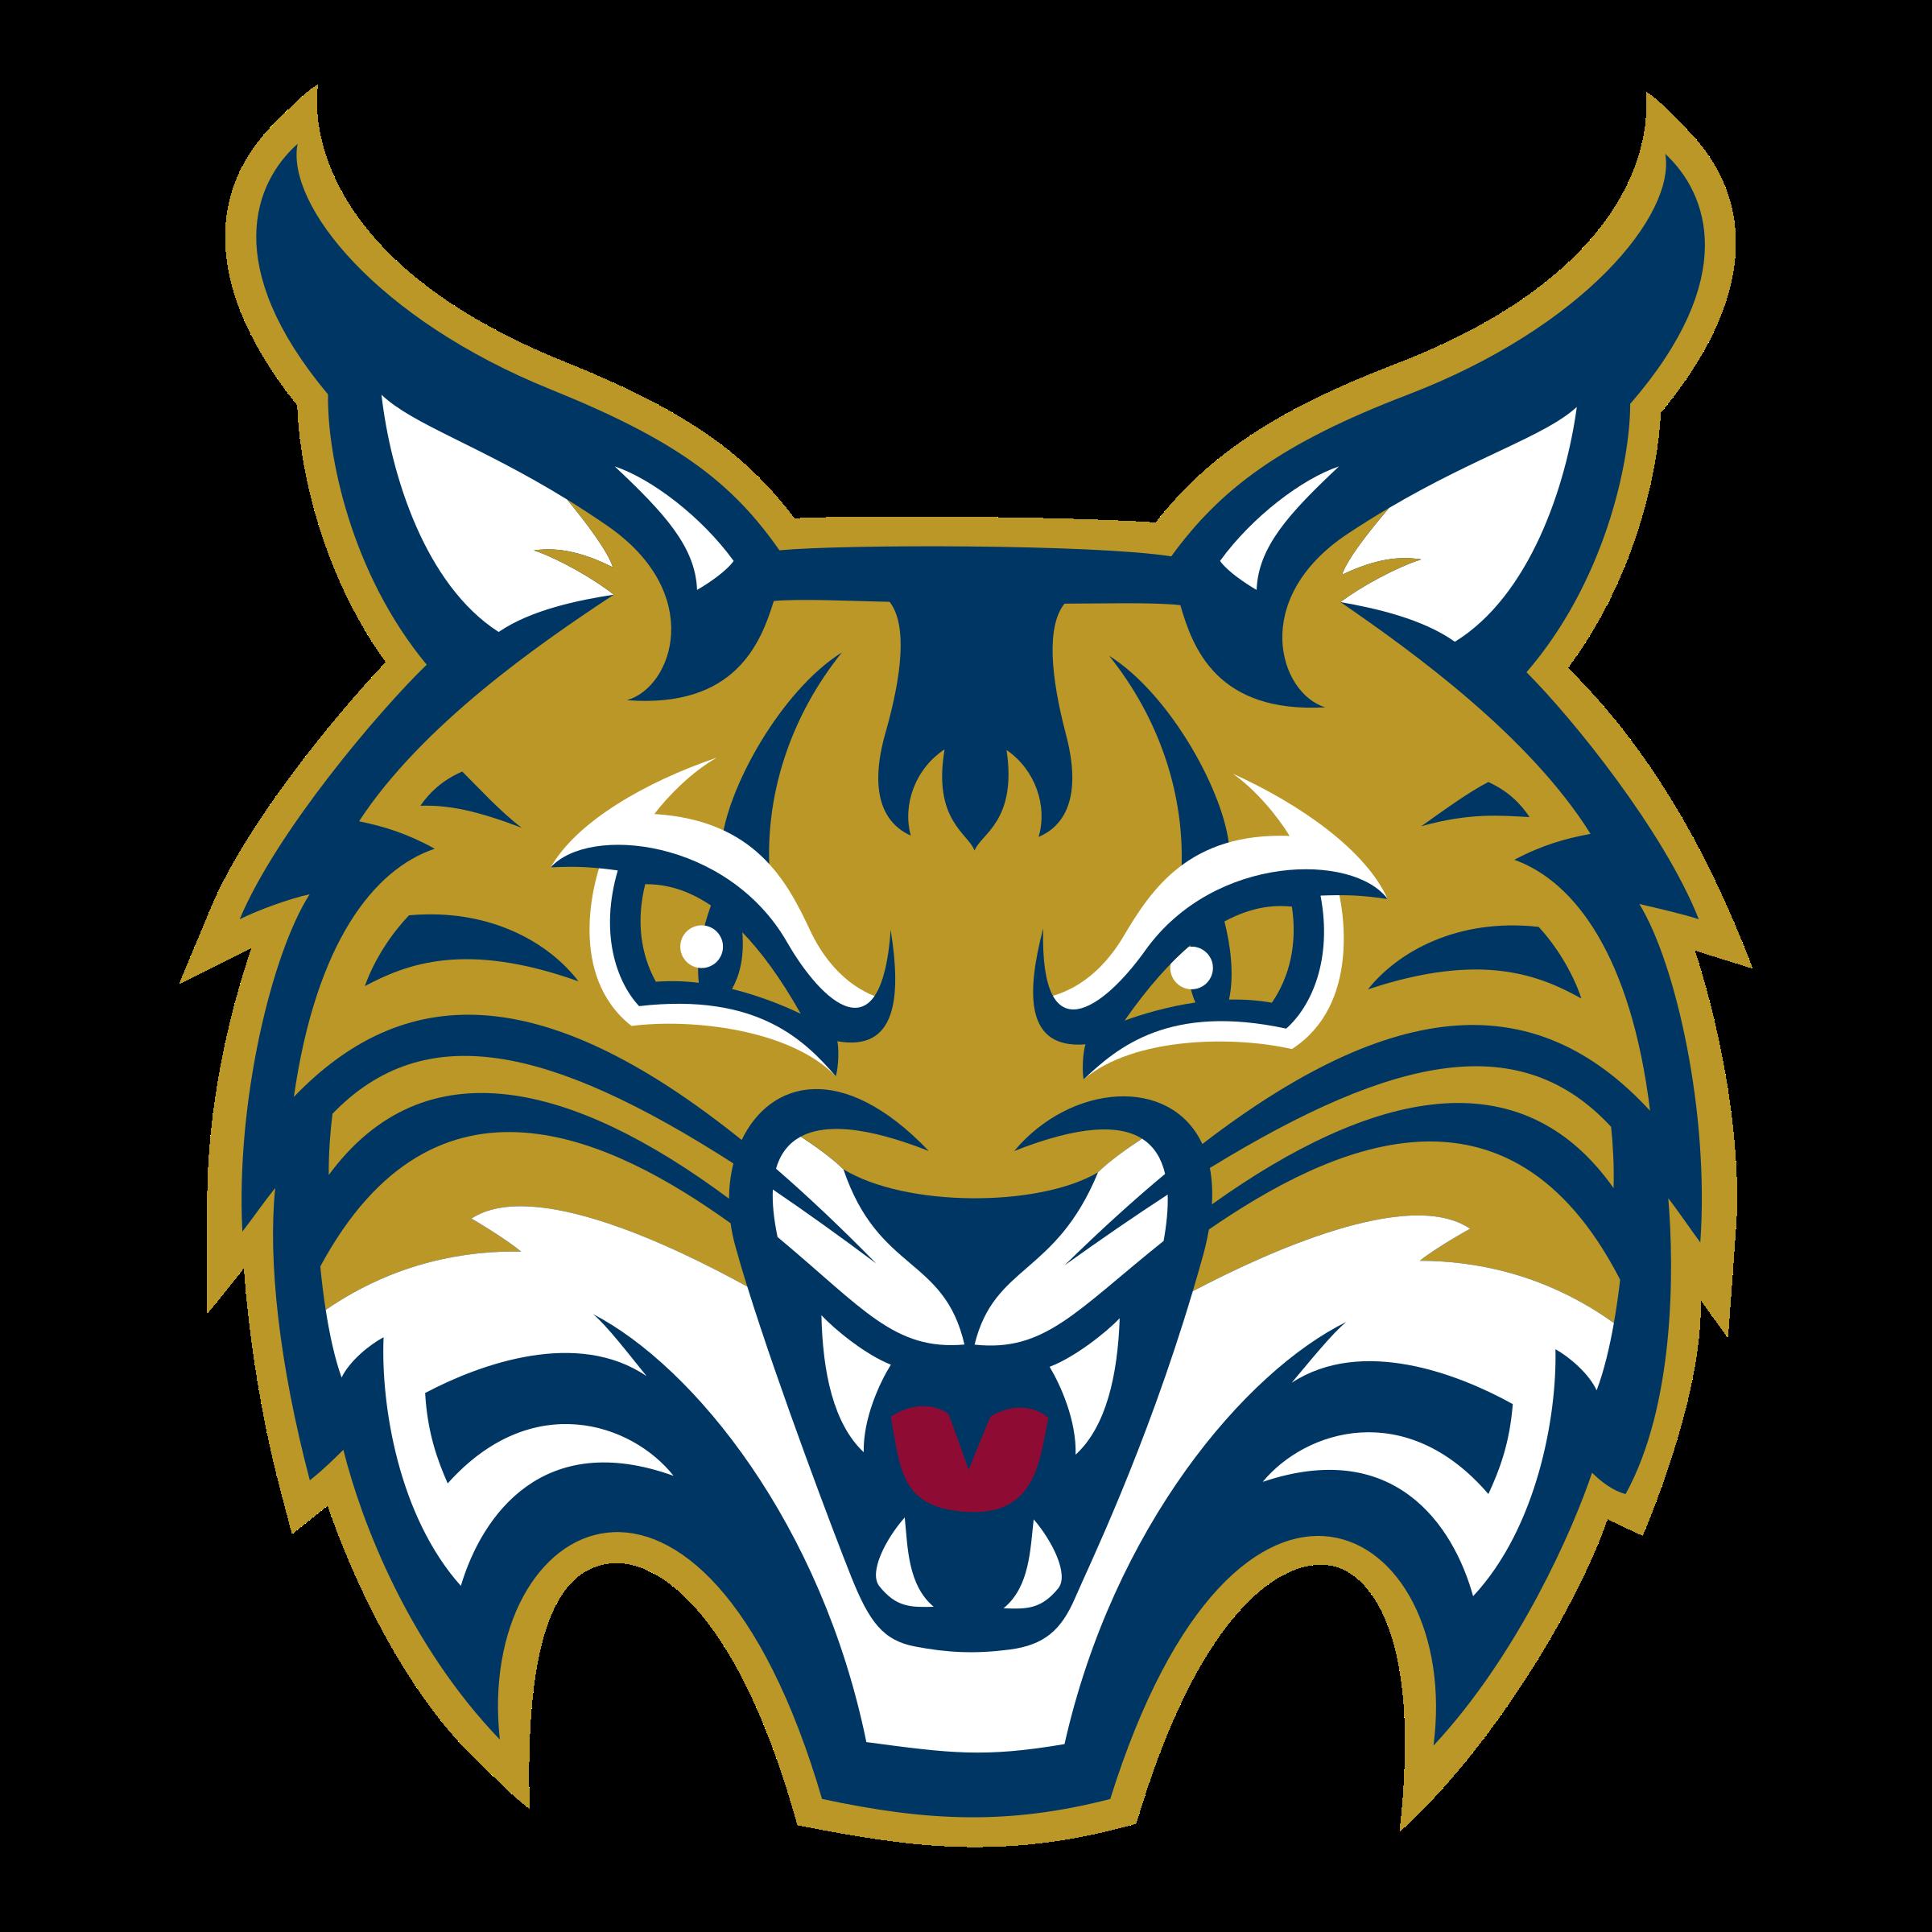 png freeuse Bobcat clipart svg. Quinnipiac bobcats logo png